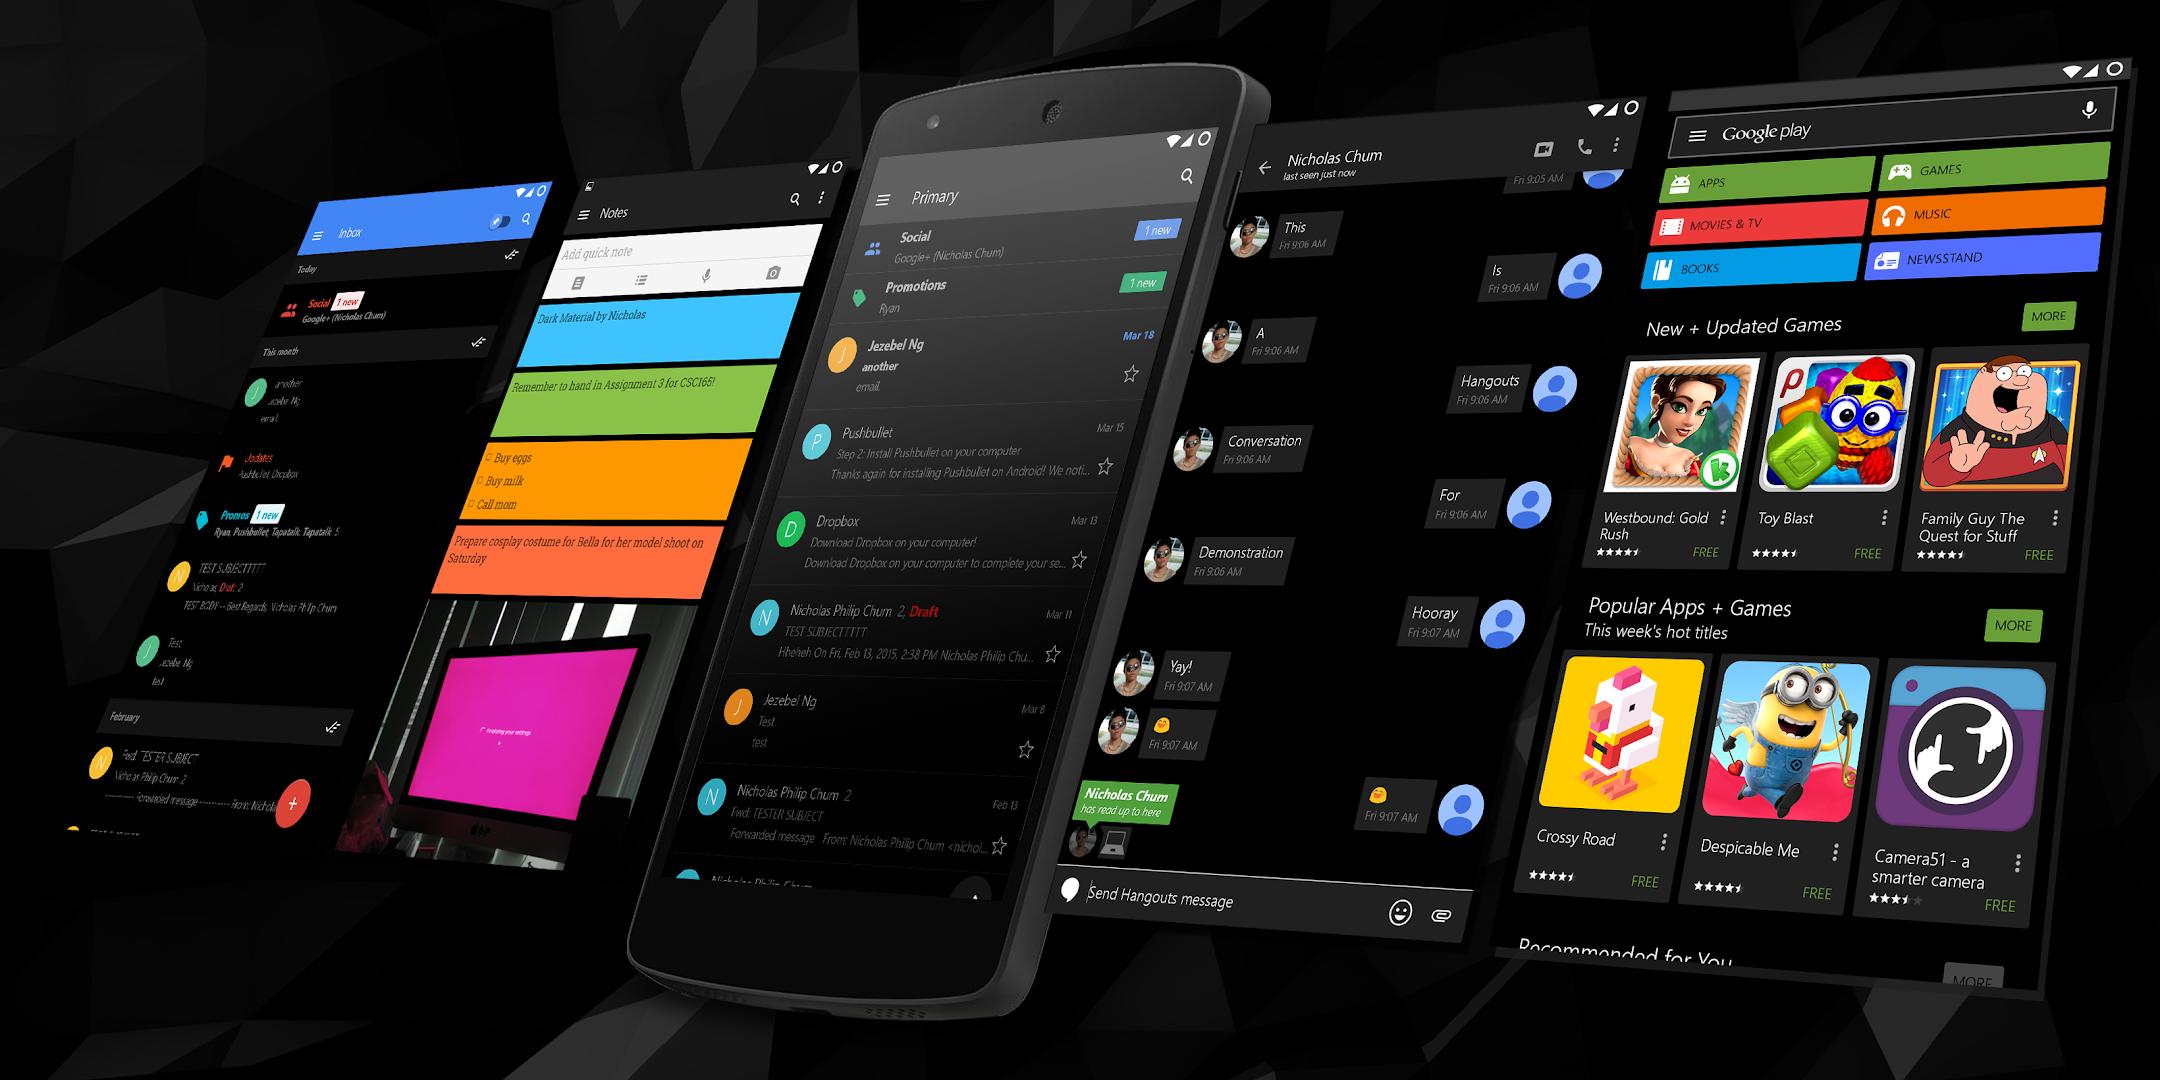 Google uk themes - Dark Material Cm12 12 1 13 Google Play Store Revenue Download Estimates France